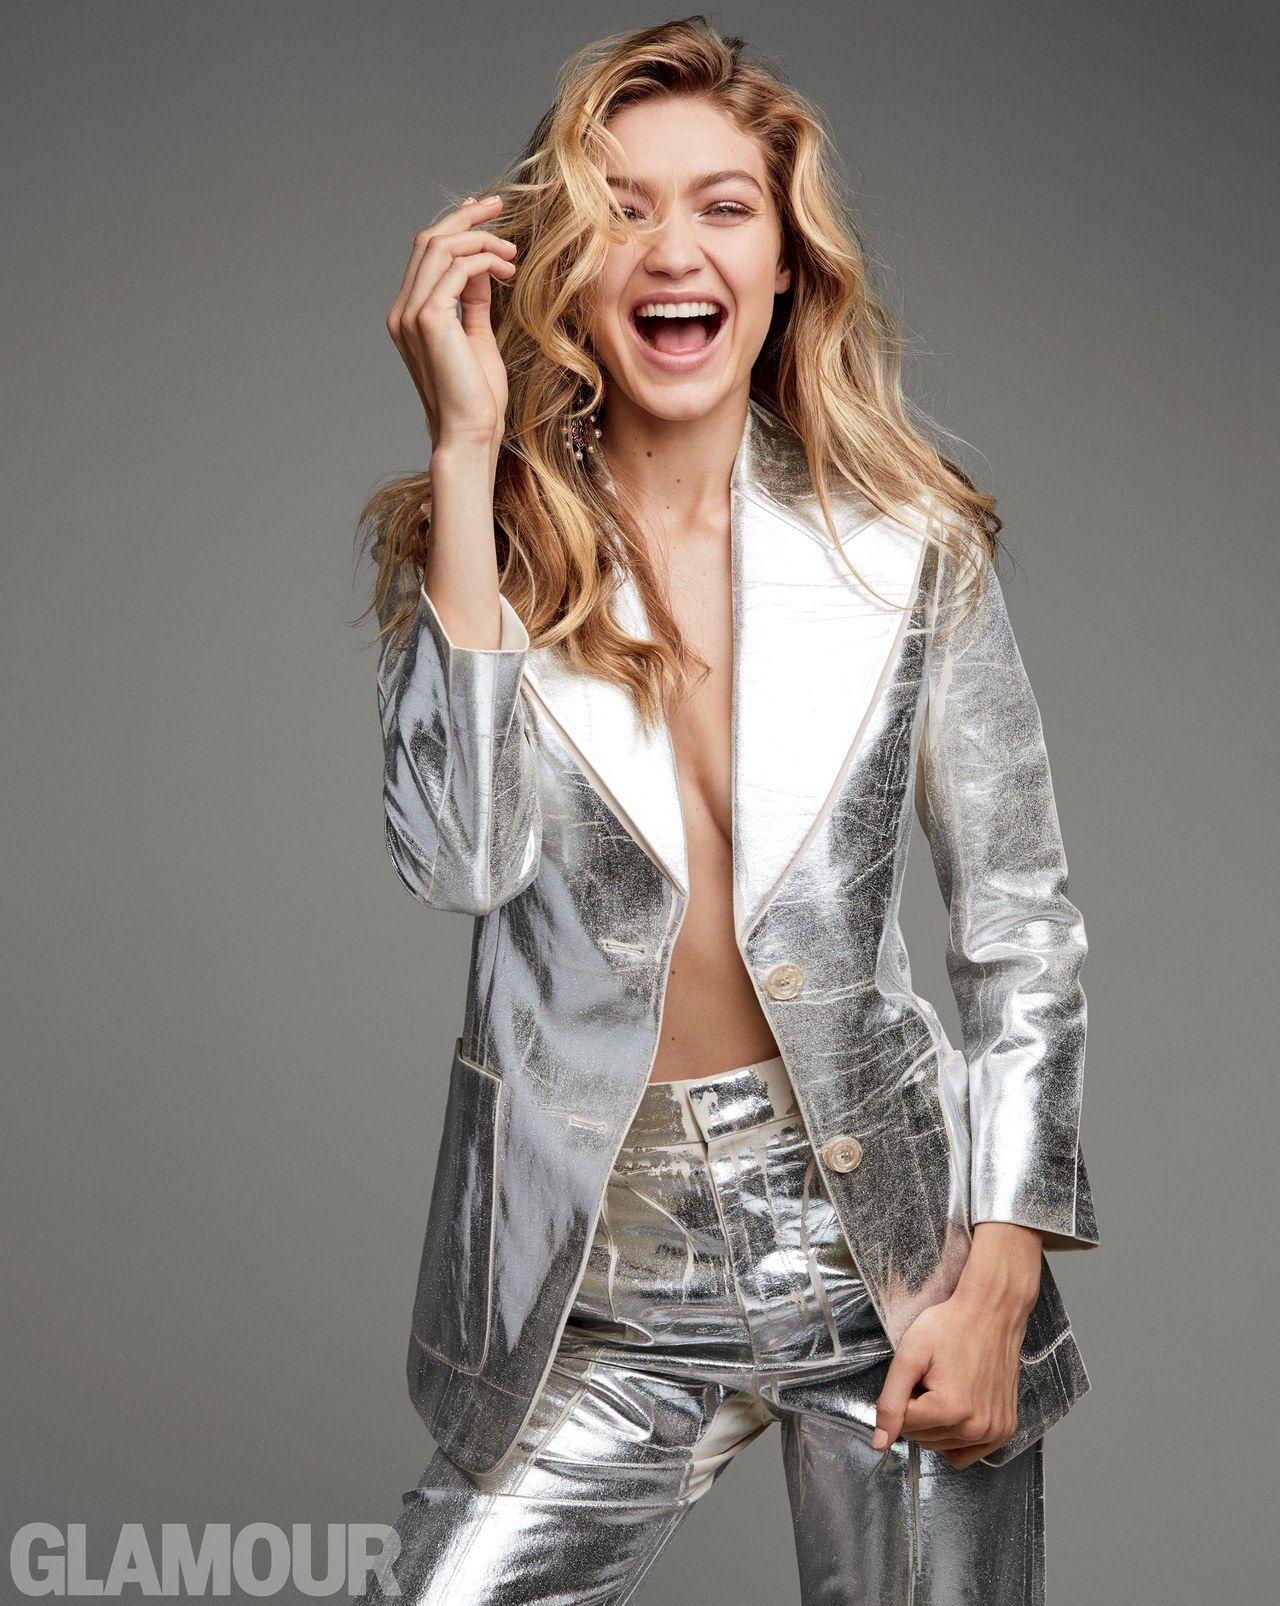 Gigi Hadid - Glamour Magazine December 2017 Photos